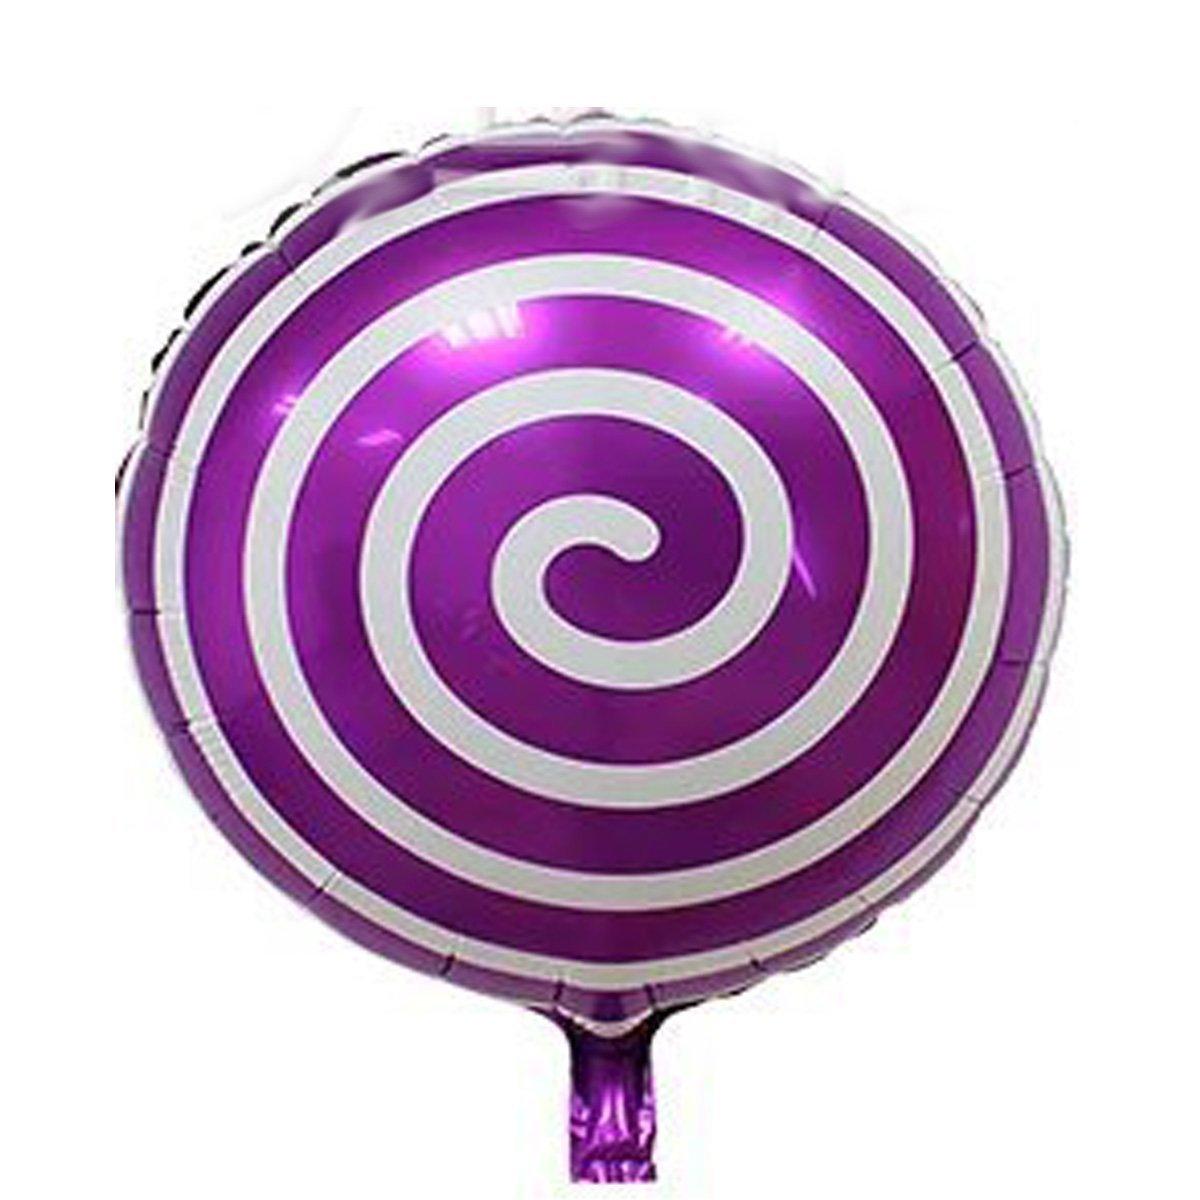 Round Lollipop Balloon Birthday Wedding Party Balloons FBA0101 AnnoDeel 12 pcs 18 Sweet Candy Balloons